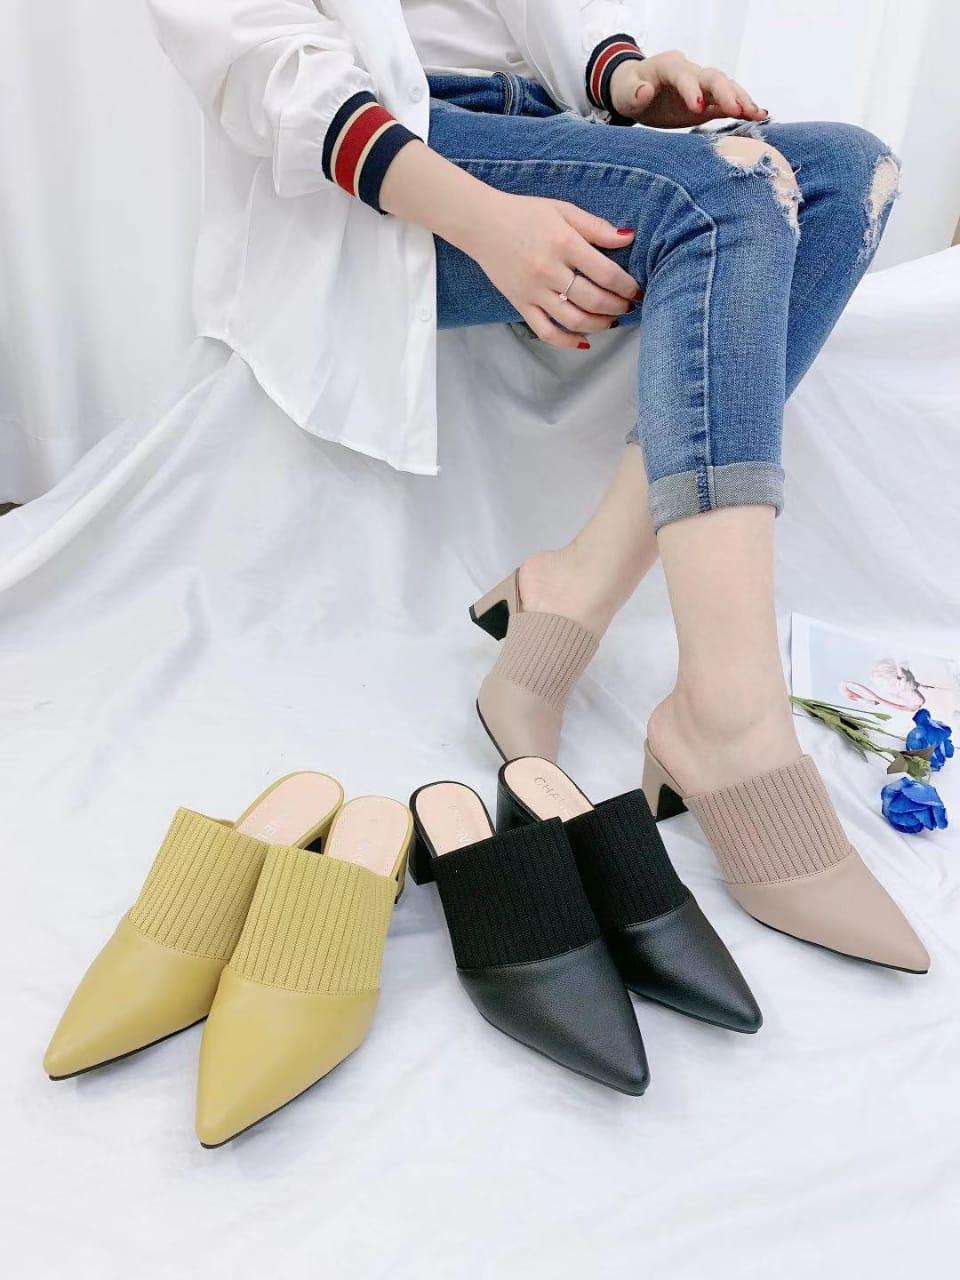 sepatu wanita terbaru dan harganya 2020610-3AJjual sepatu kw batam,jual sepatu wanita murah,jual sepatu wanita ukuran besar